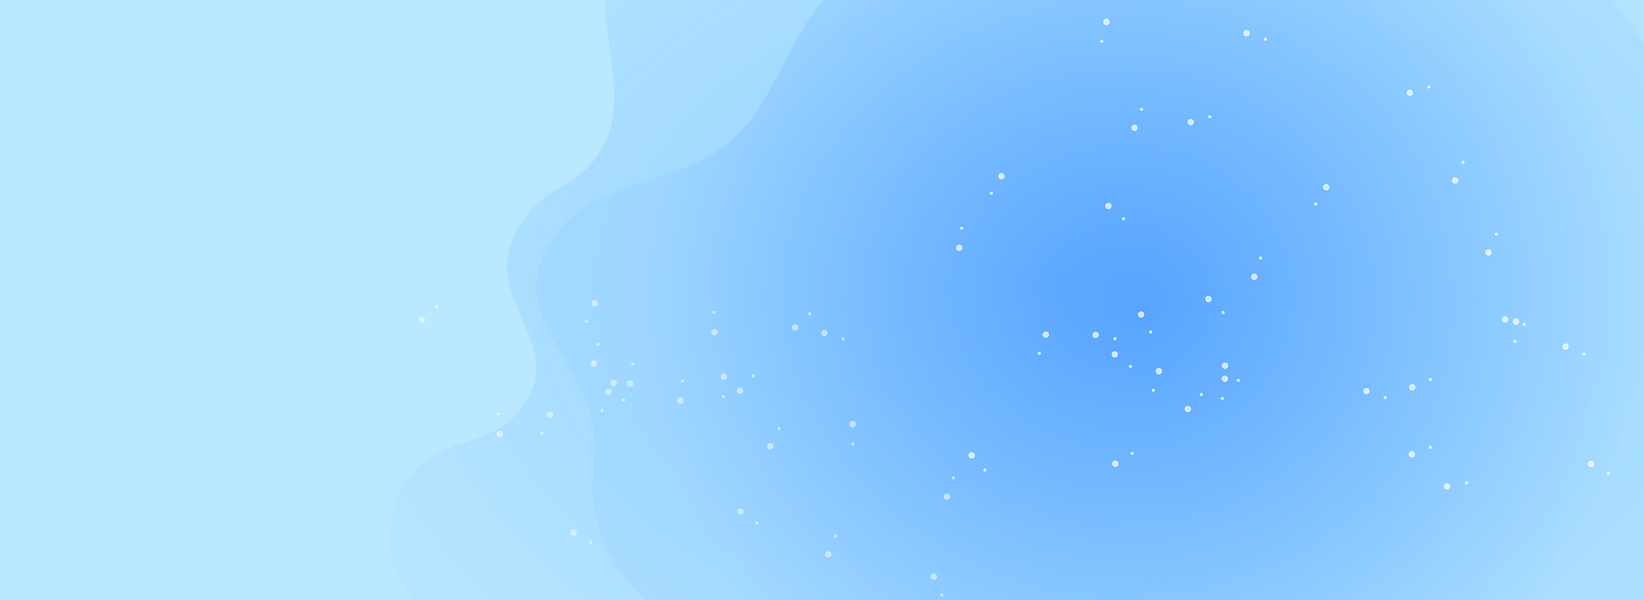 web xr_內容_工作區域 1.png